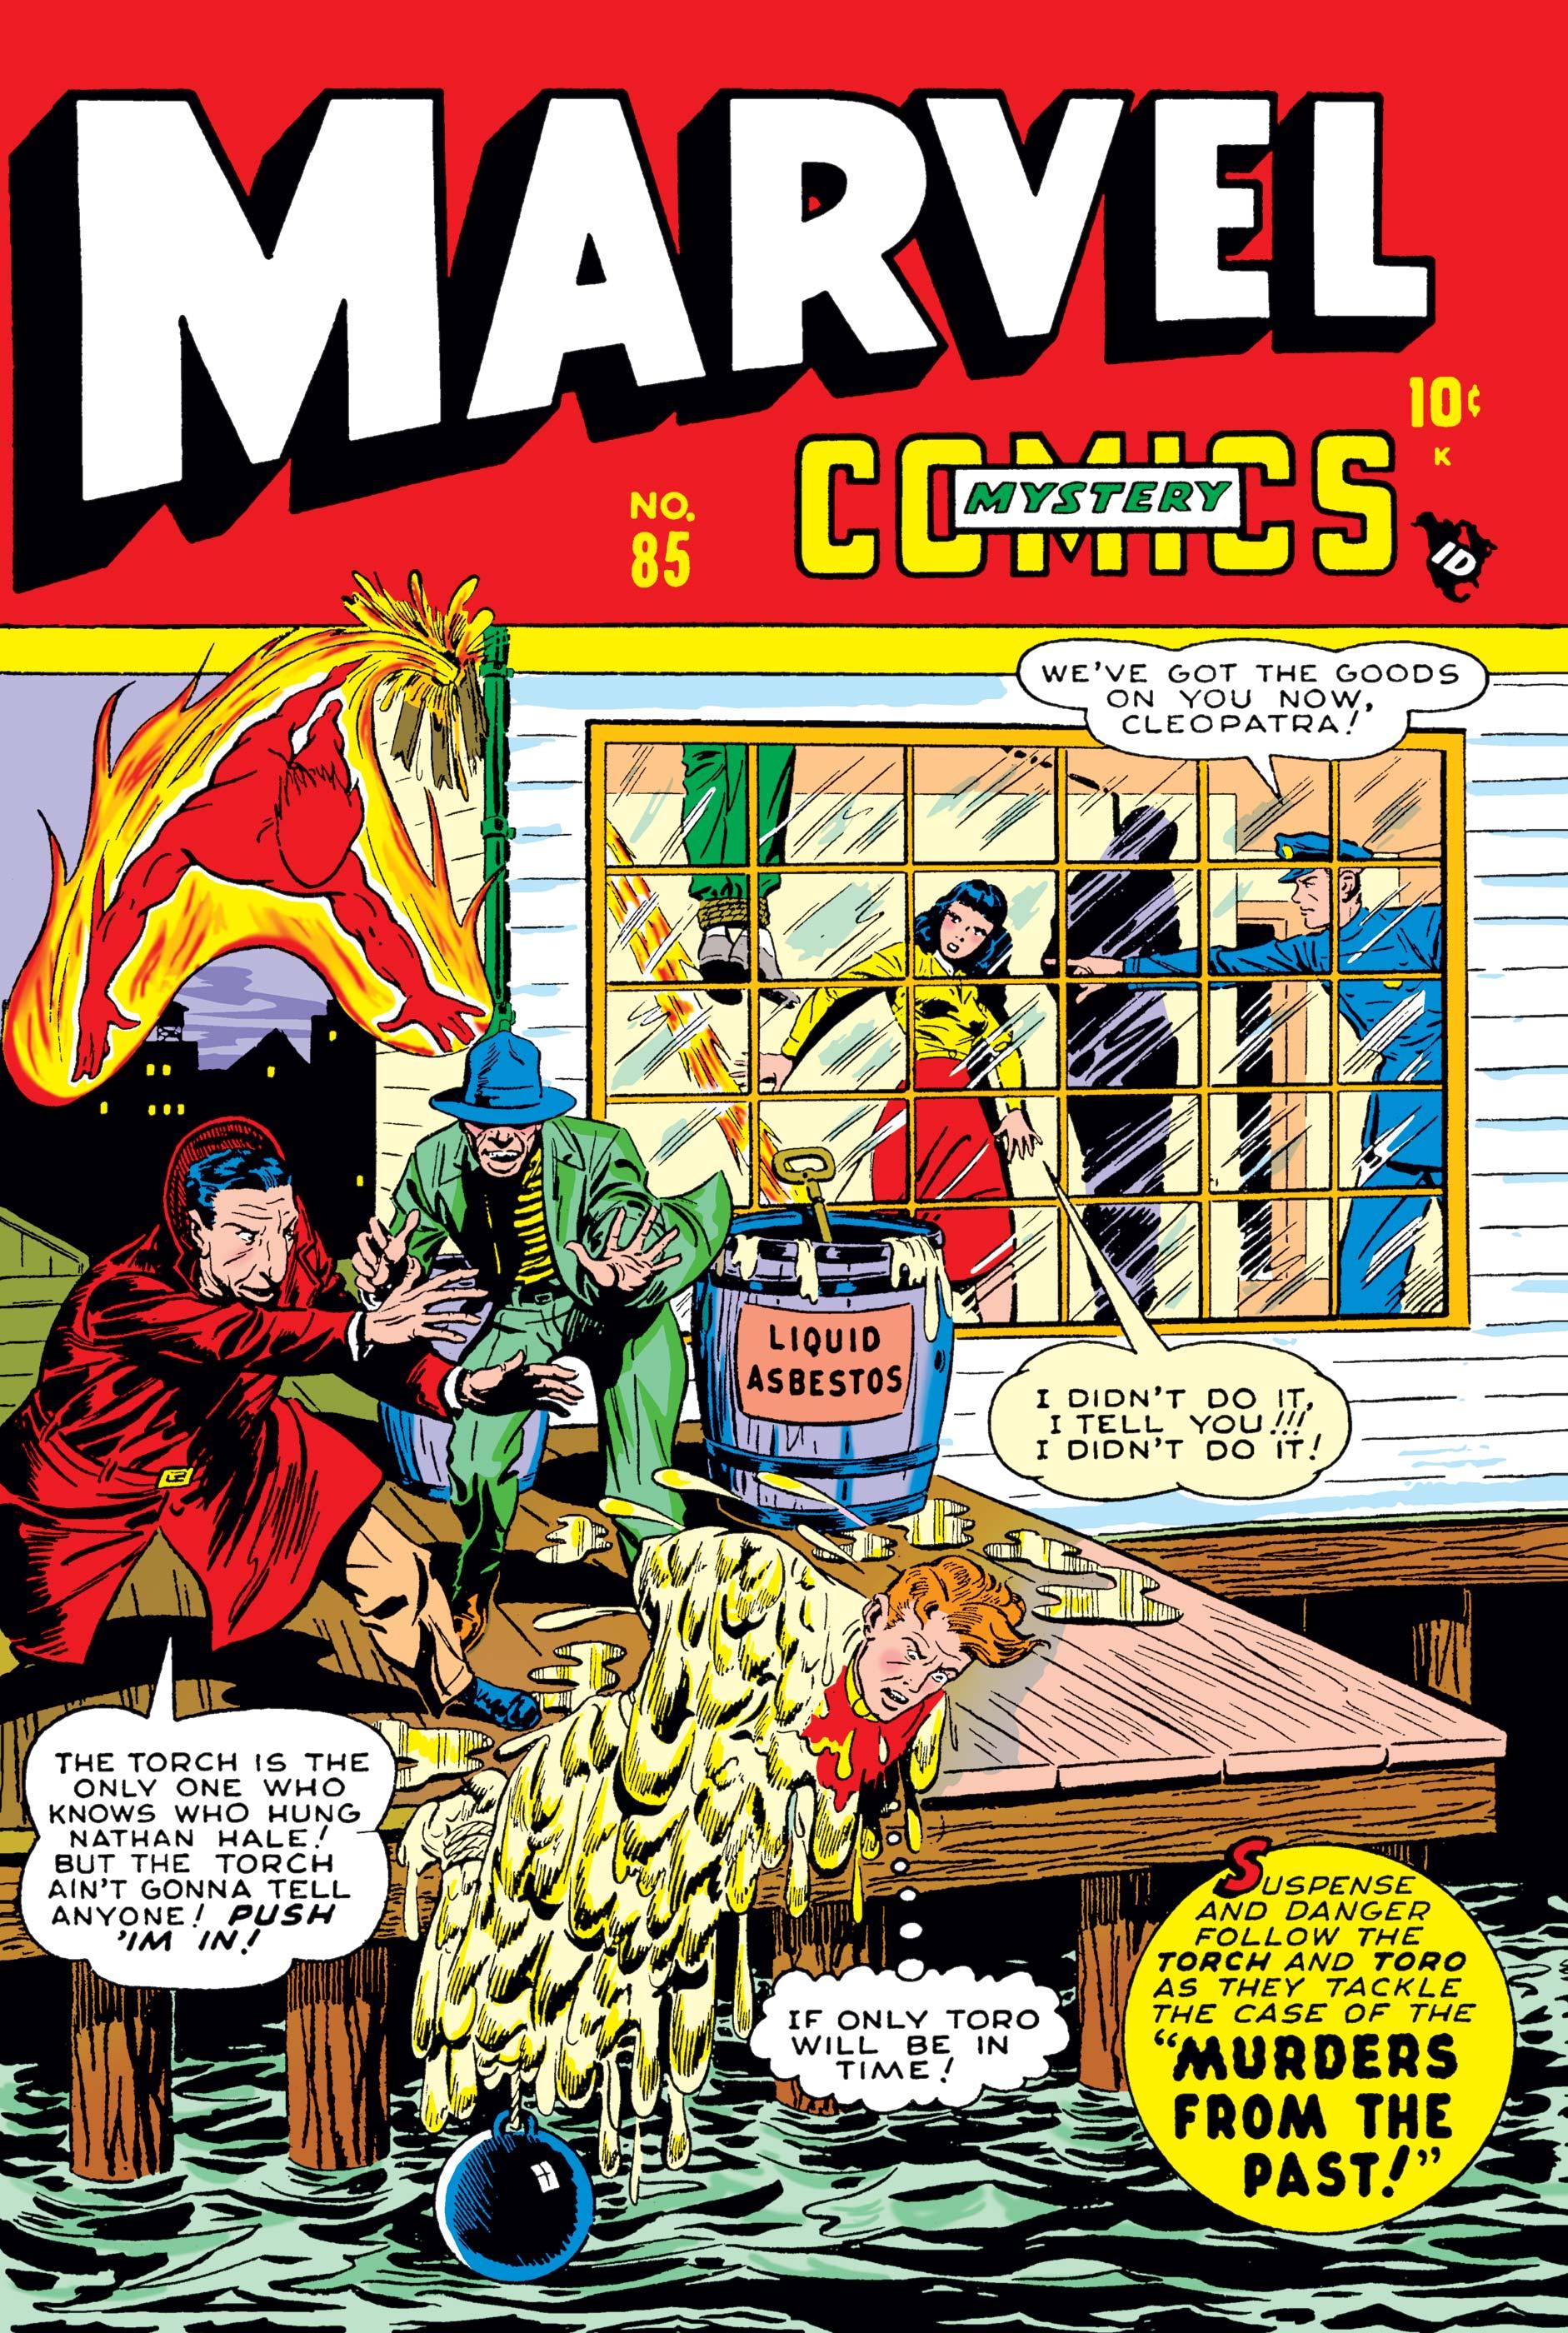 Marvel Mystery Comics (1939) #85